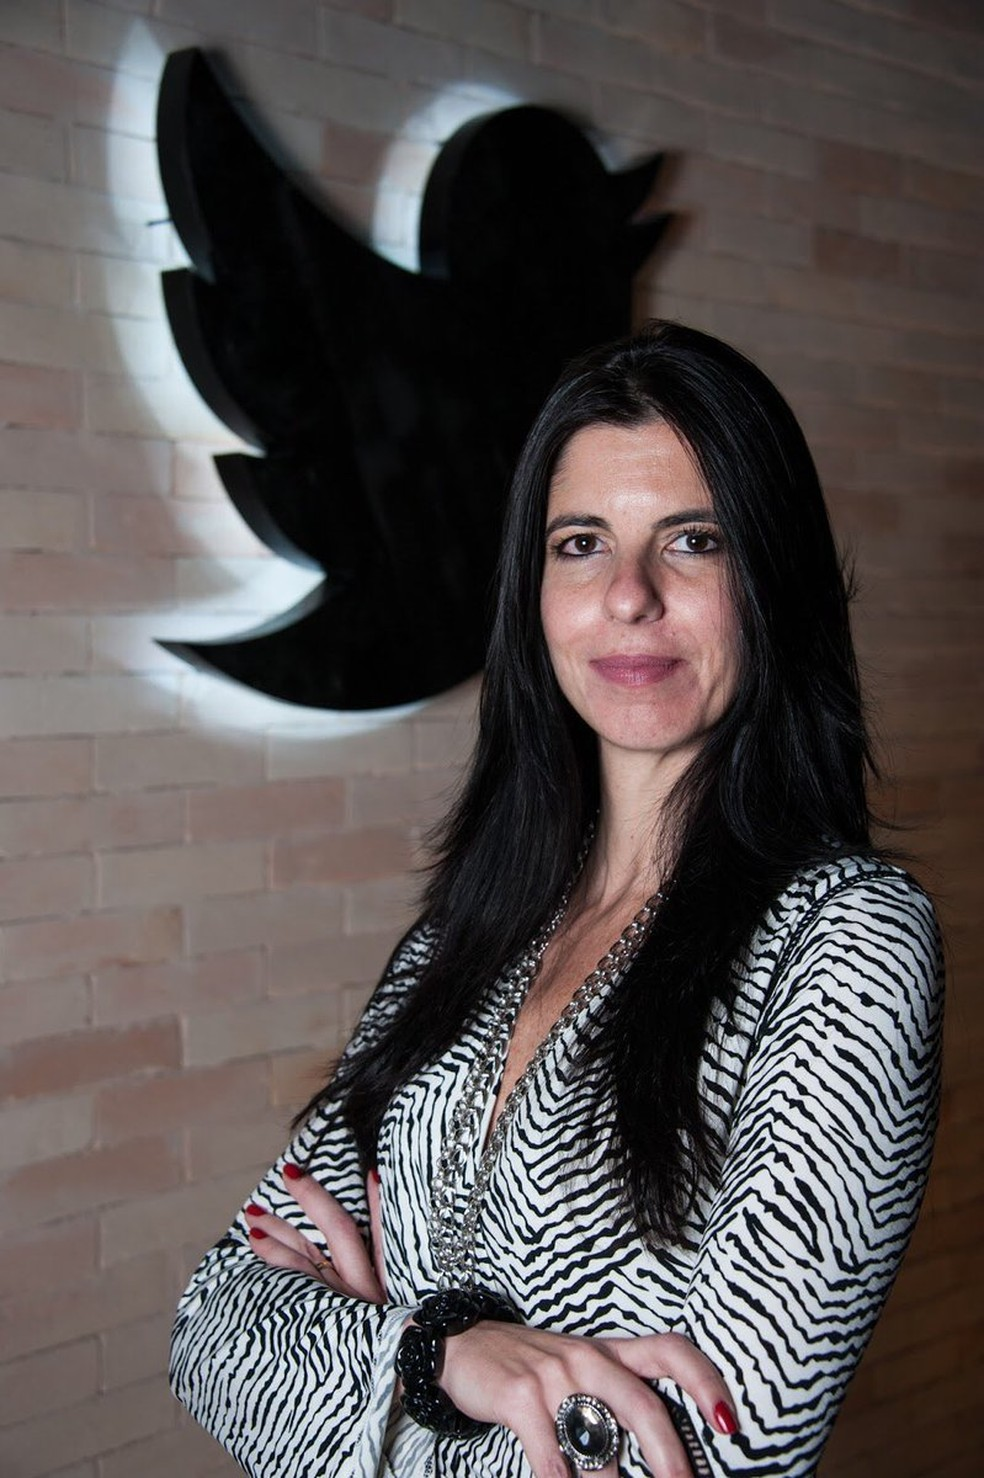 Fiamma Zarife, diretora-geral do Twitter no Brasil (Foto: Divulgação/Twitter)